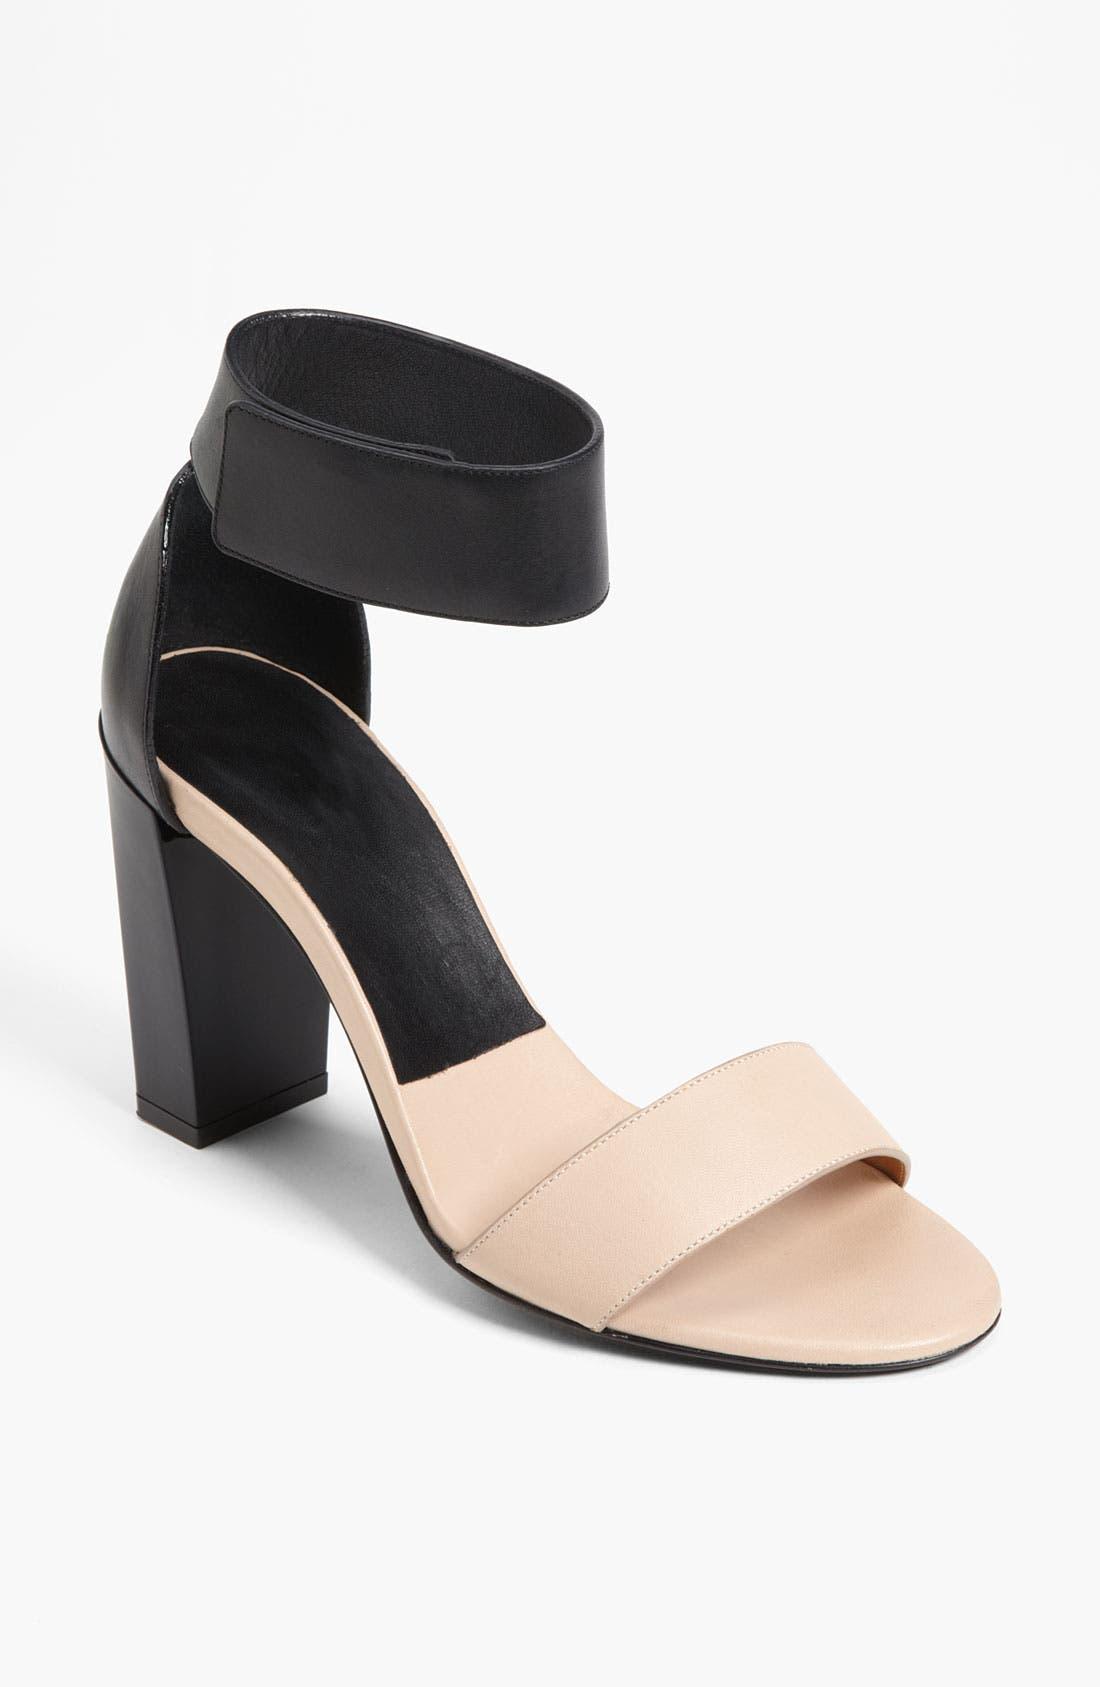 Alternate Image 1 Selected - Chloé Ankle Strap Sandal